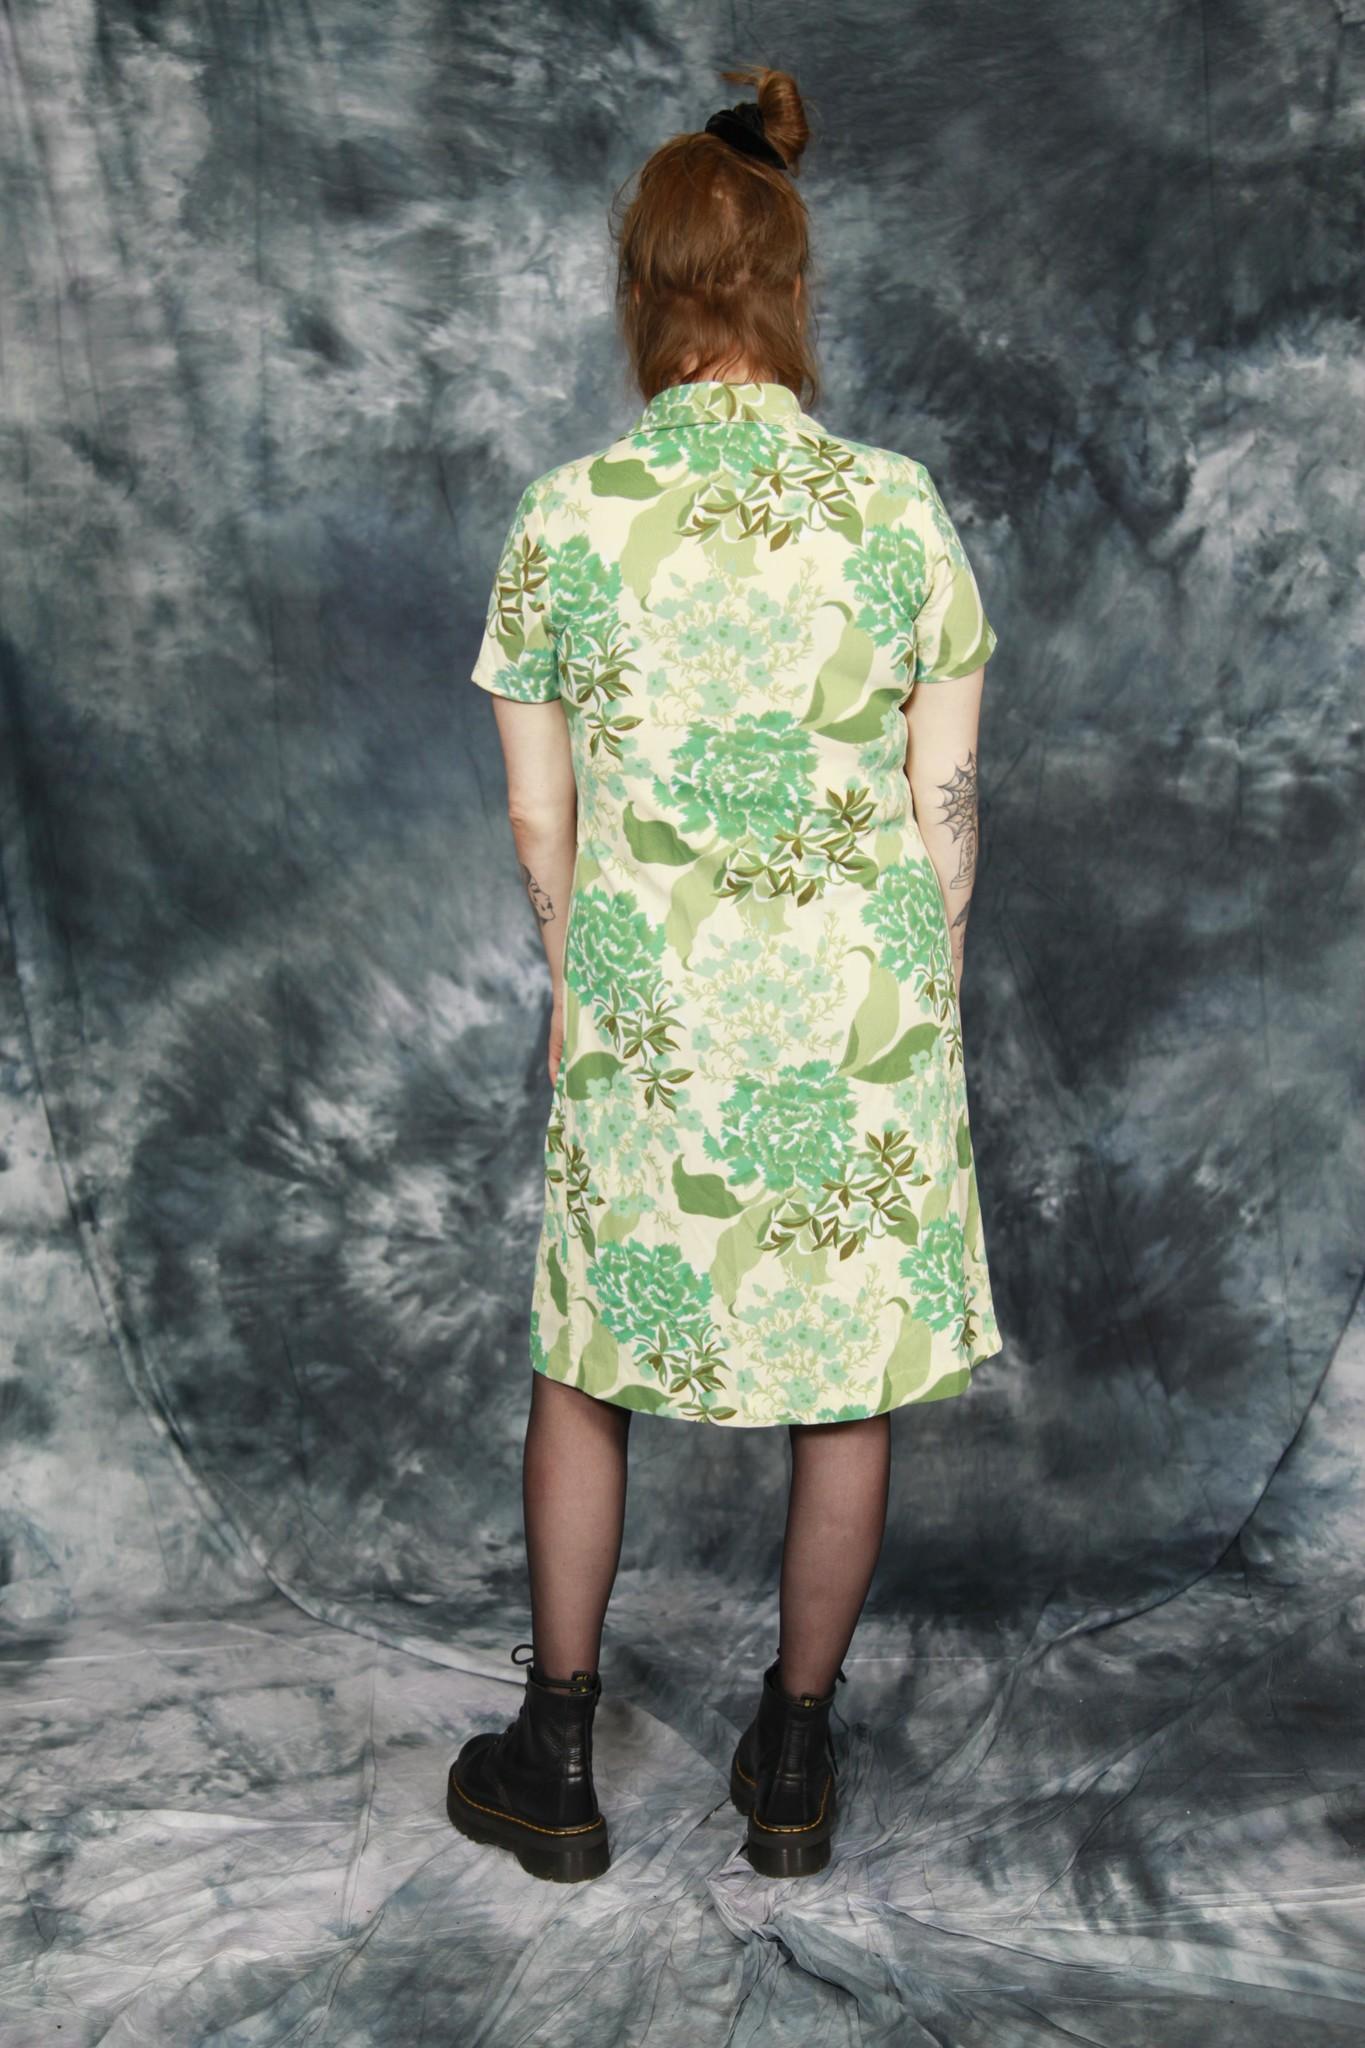 Green floral 70s dress